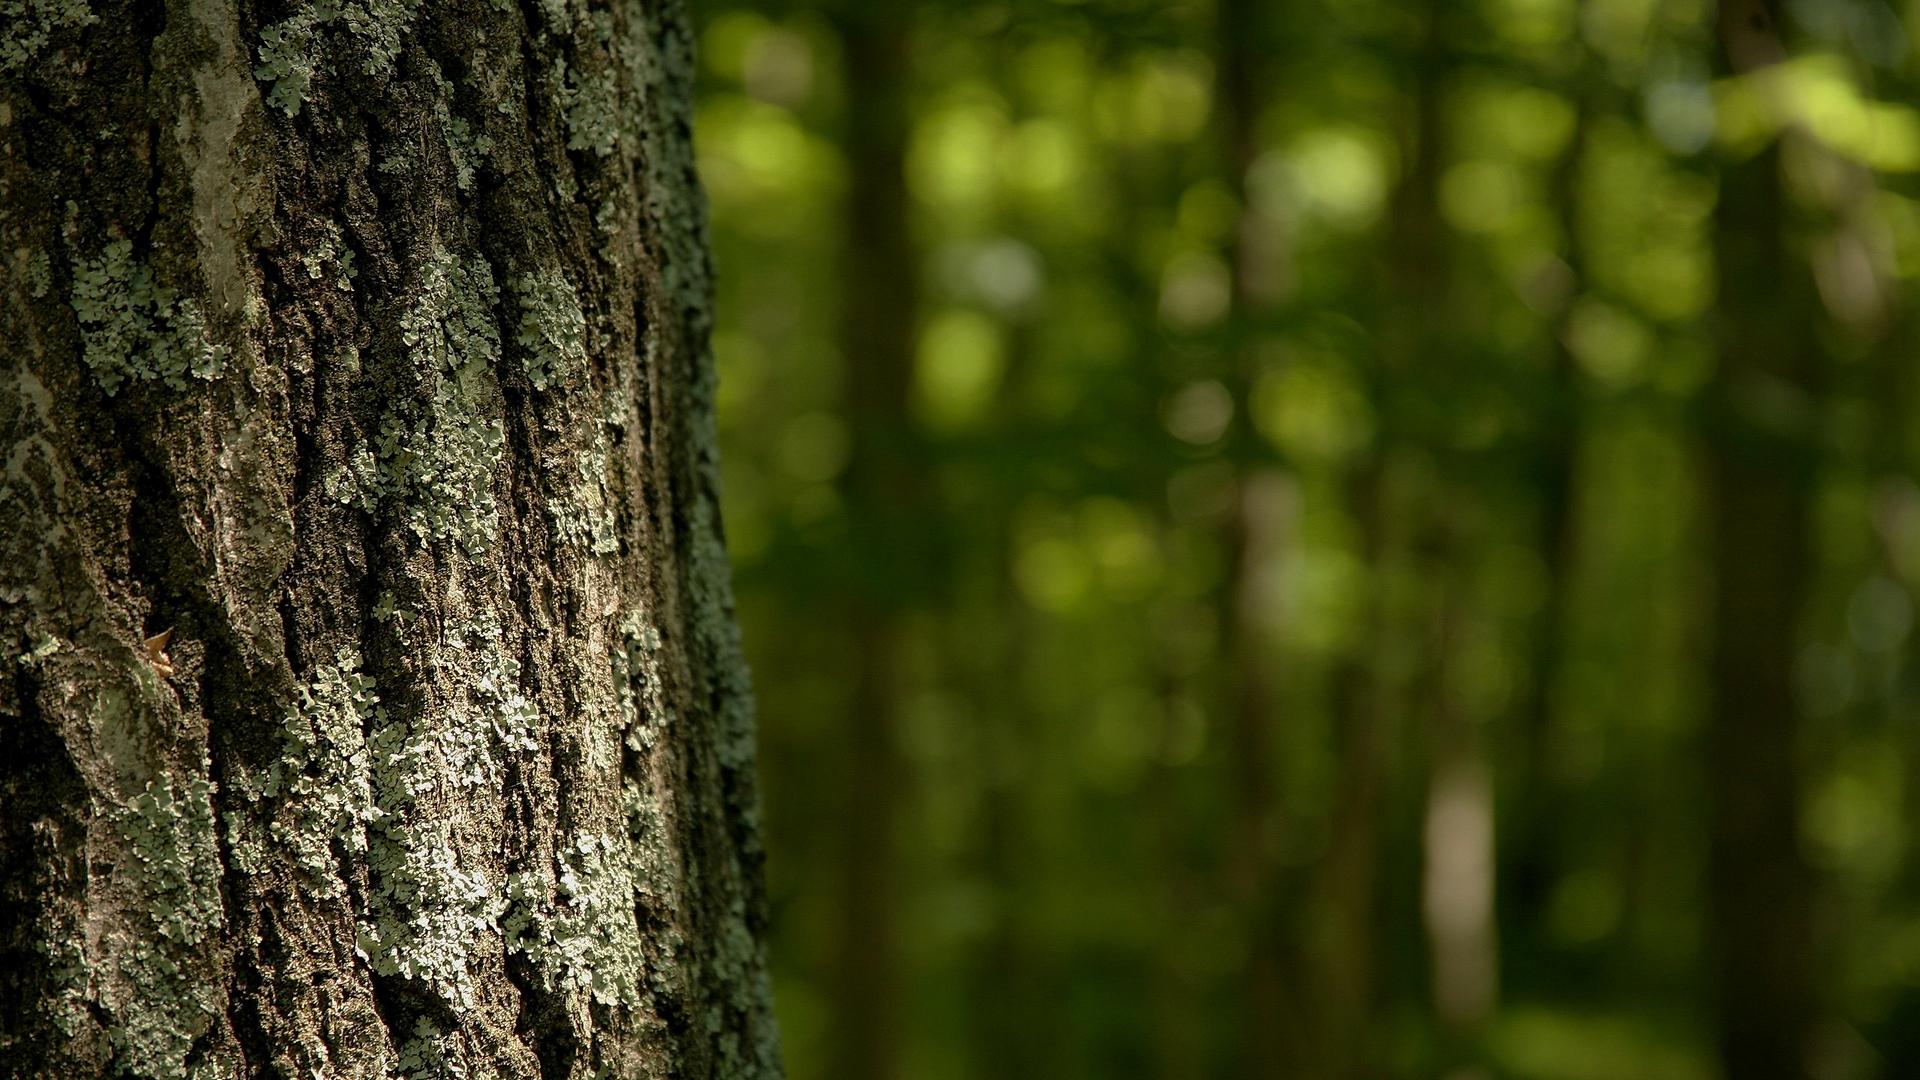 Green bark background photo